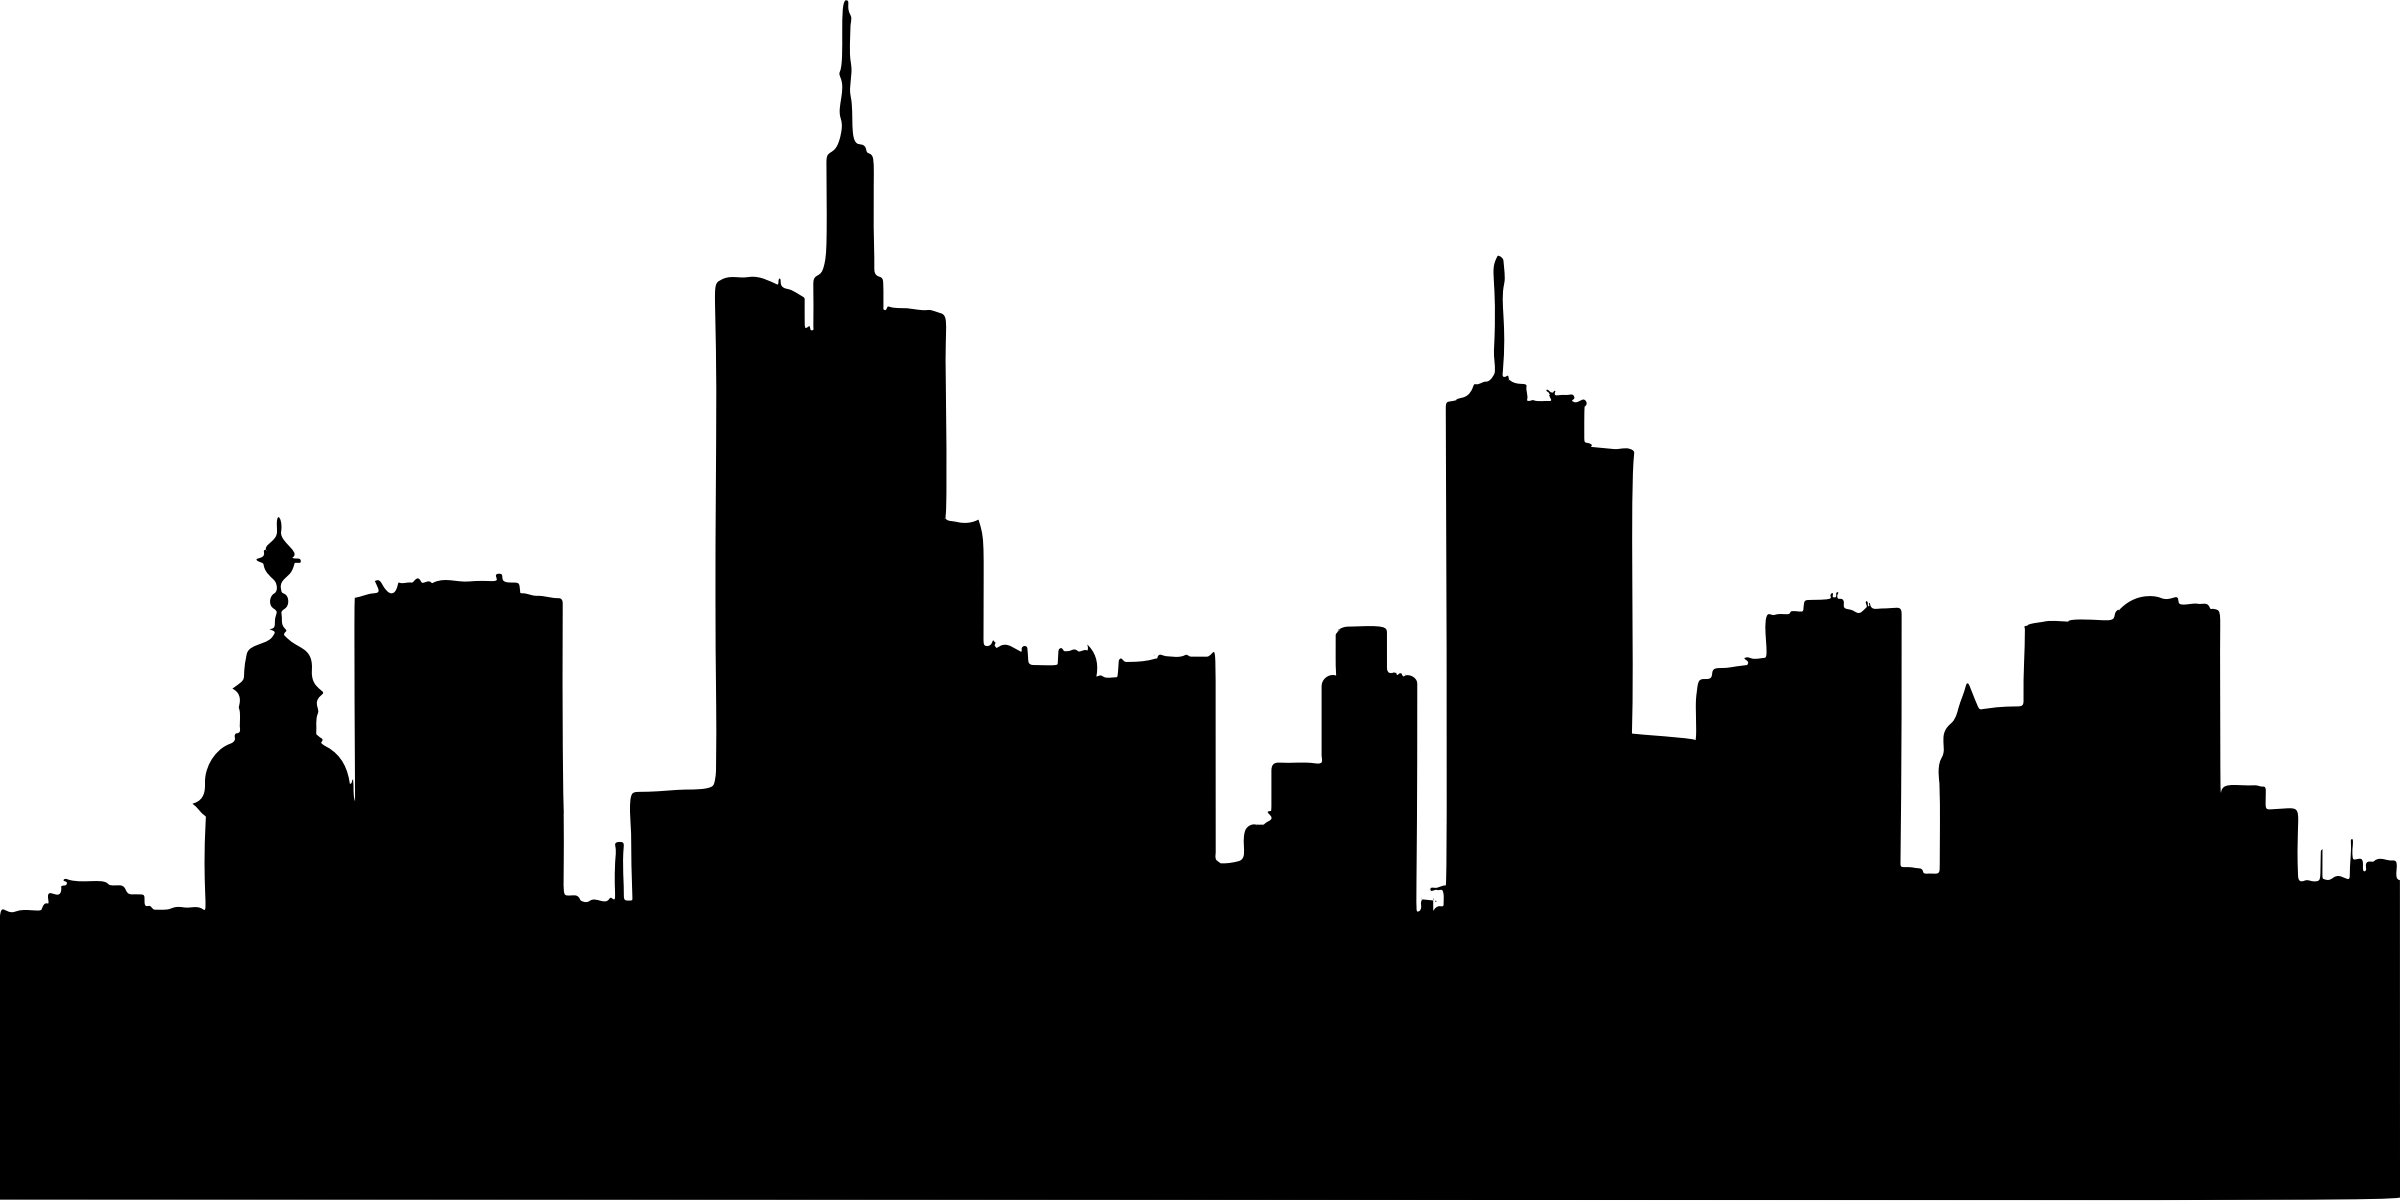 Clipart frankfurt skyline silhouette for Graphic design frankfurt